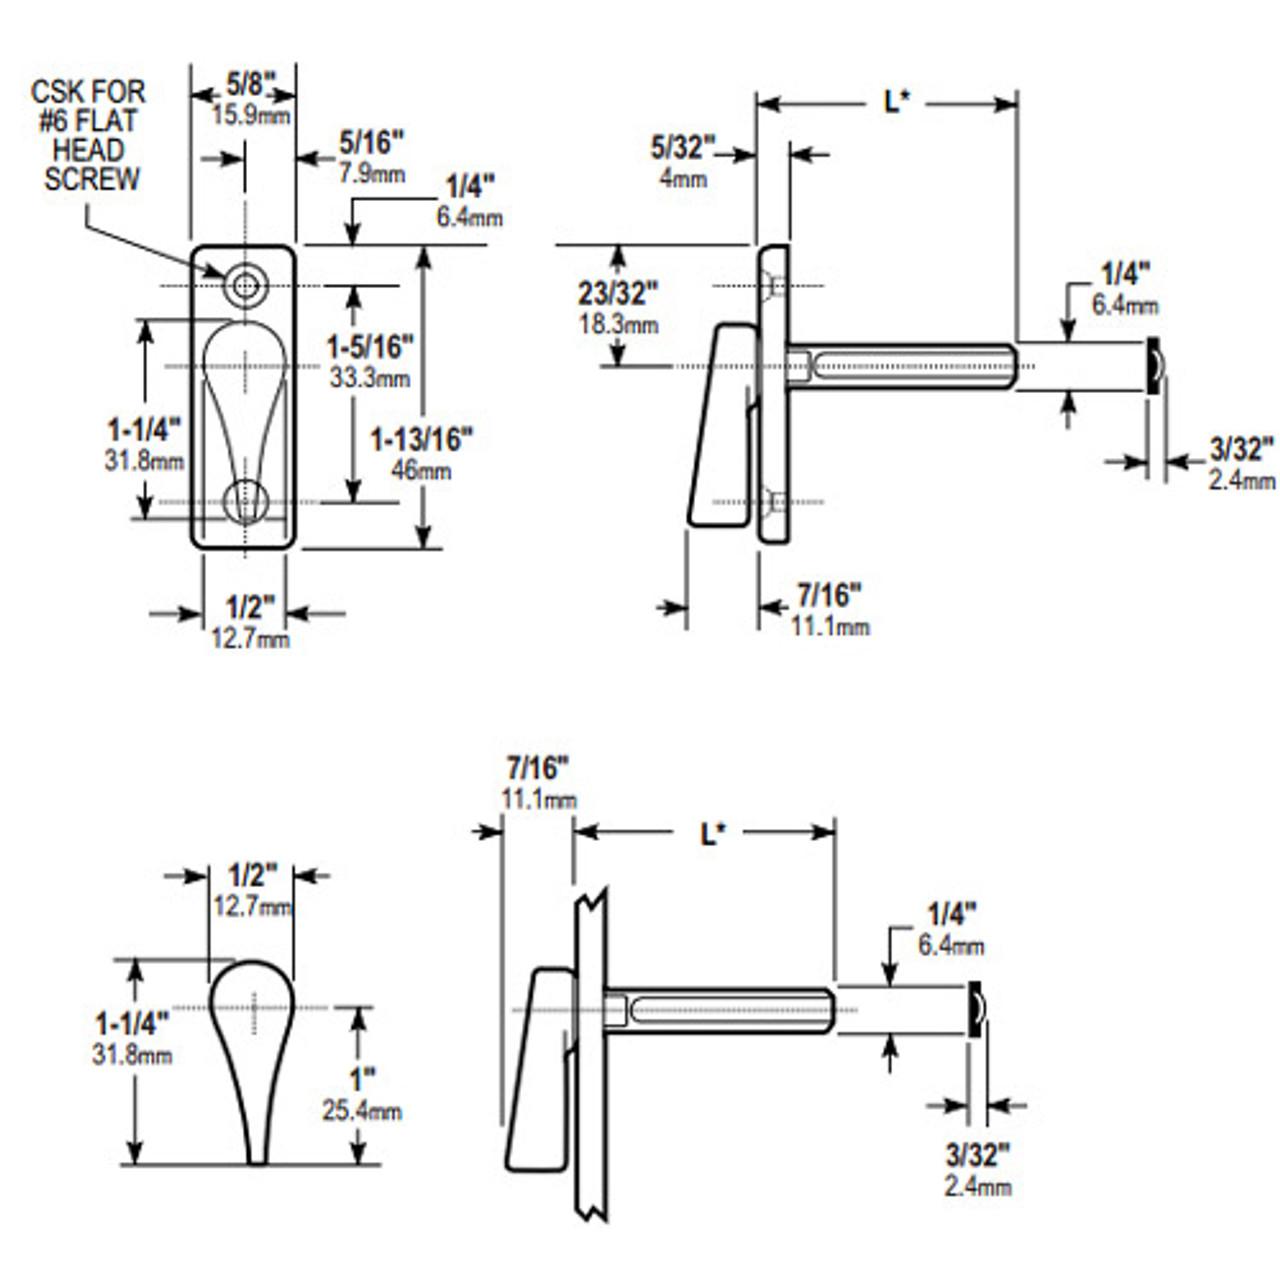 1000-02-23-121 Adams Rite 1000 Series Turns Dimensional View